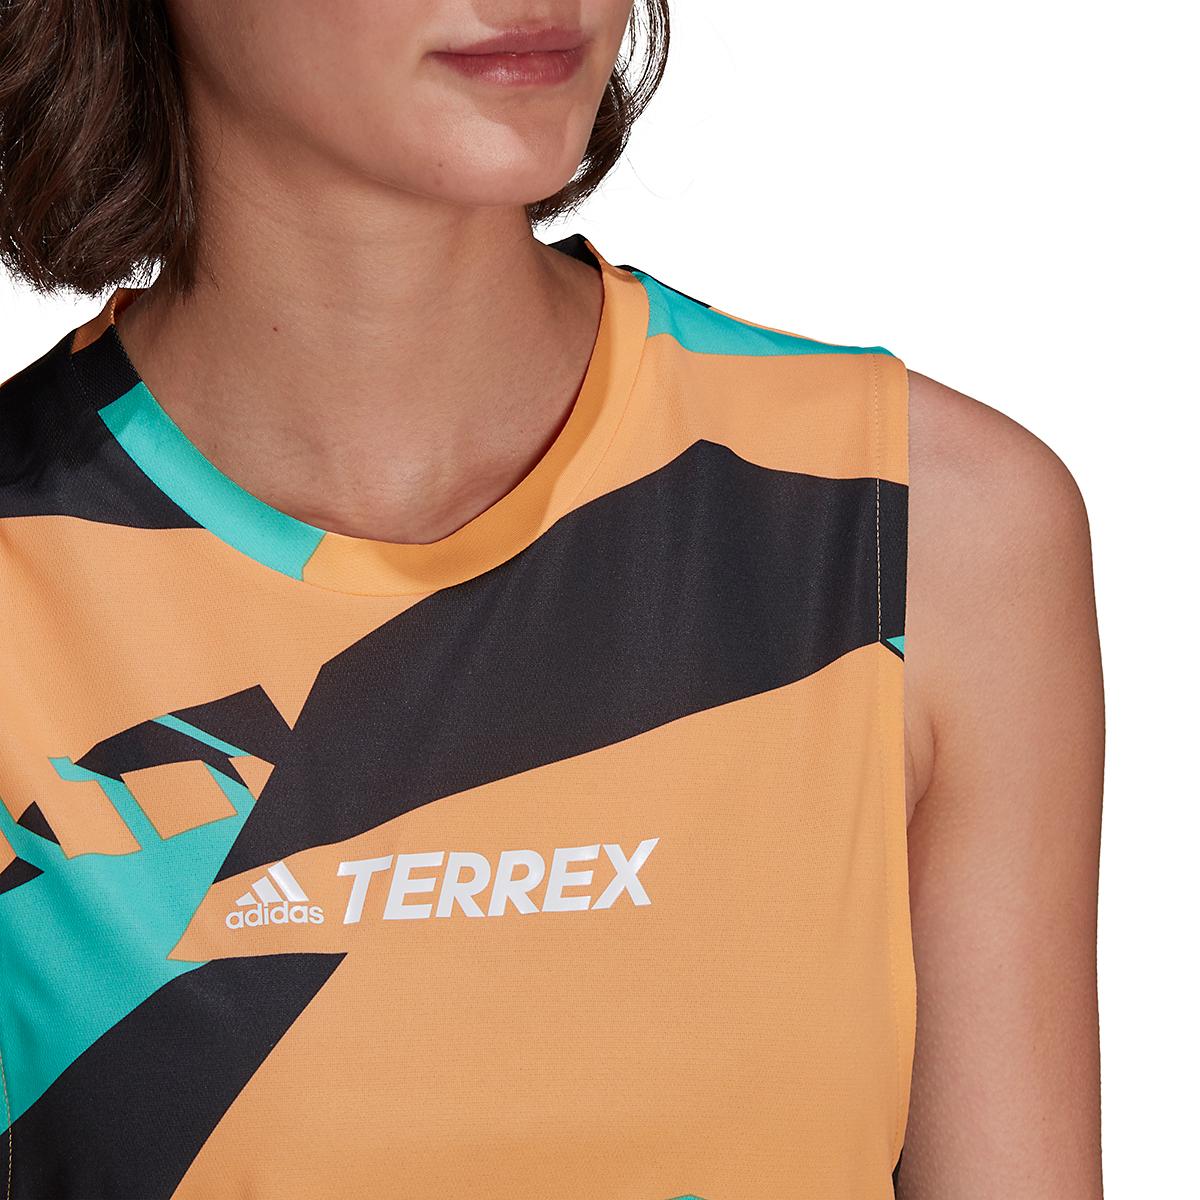 Women's Adidas Terrex Parley Agravic TR Tank Top - Color: Hazy Orange - Size: XS, Hazy Orange, large, image 4